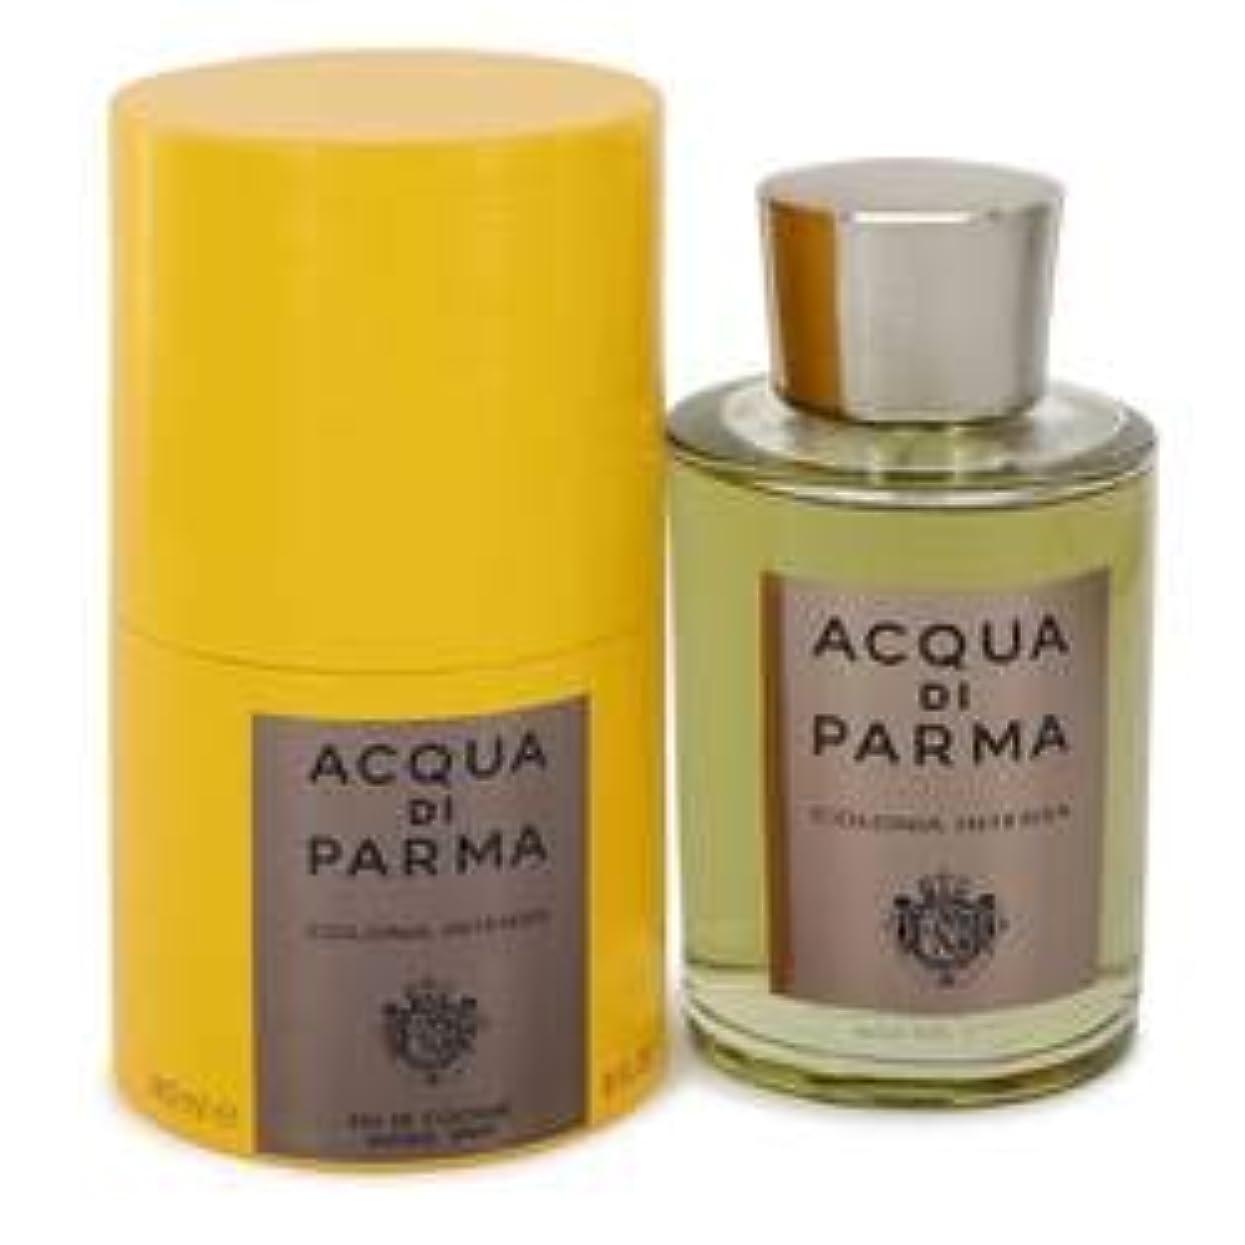 有毒ルーフ意識的Acqua Di Parma Colonia Intensa Eau De Cologne Spray By Acqua Di Parma